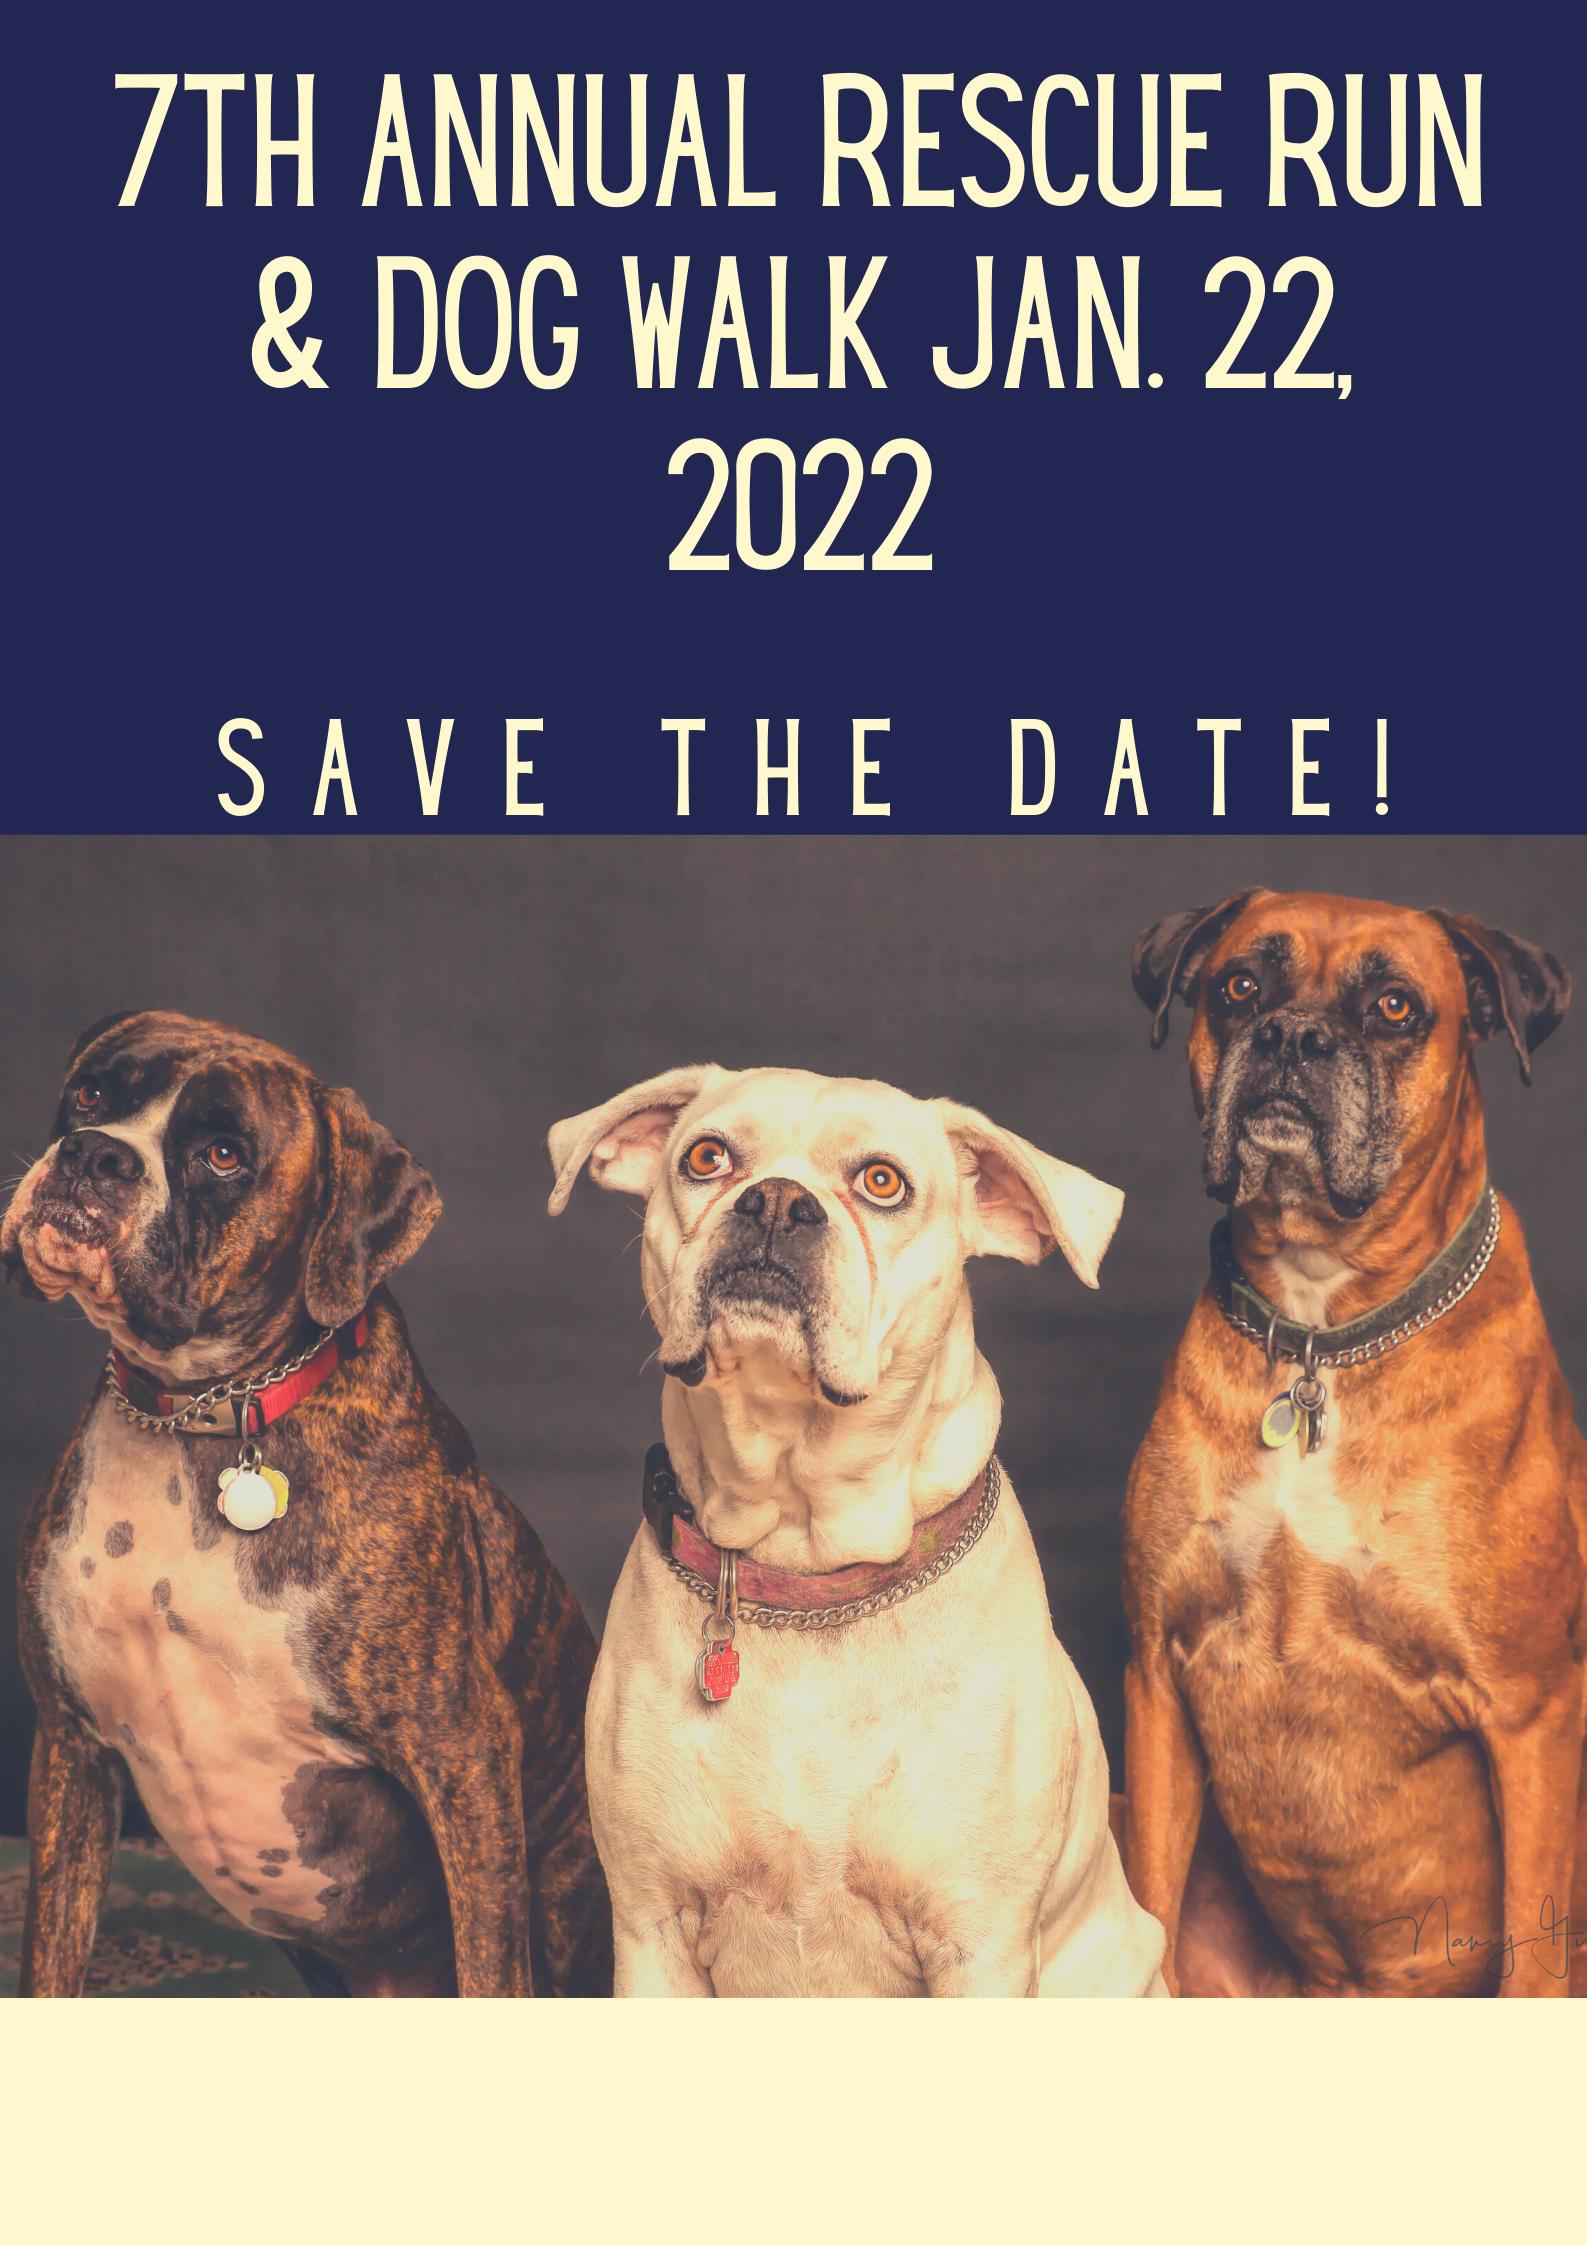 2022 7th Annual Rescue Run & Dog Walk